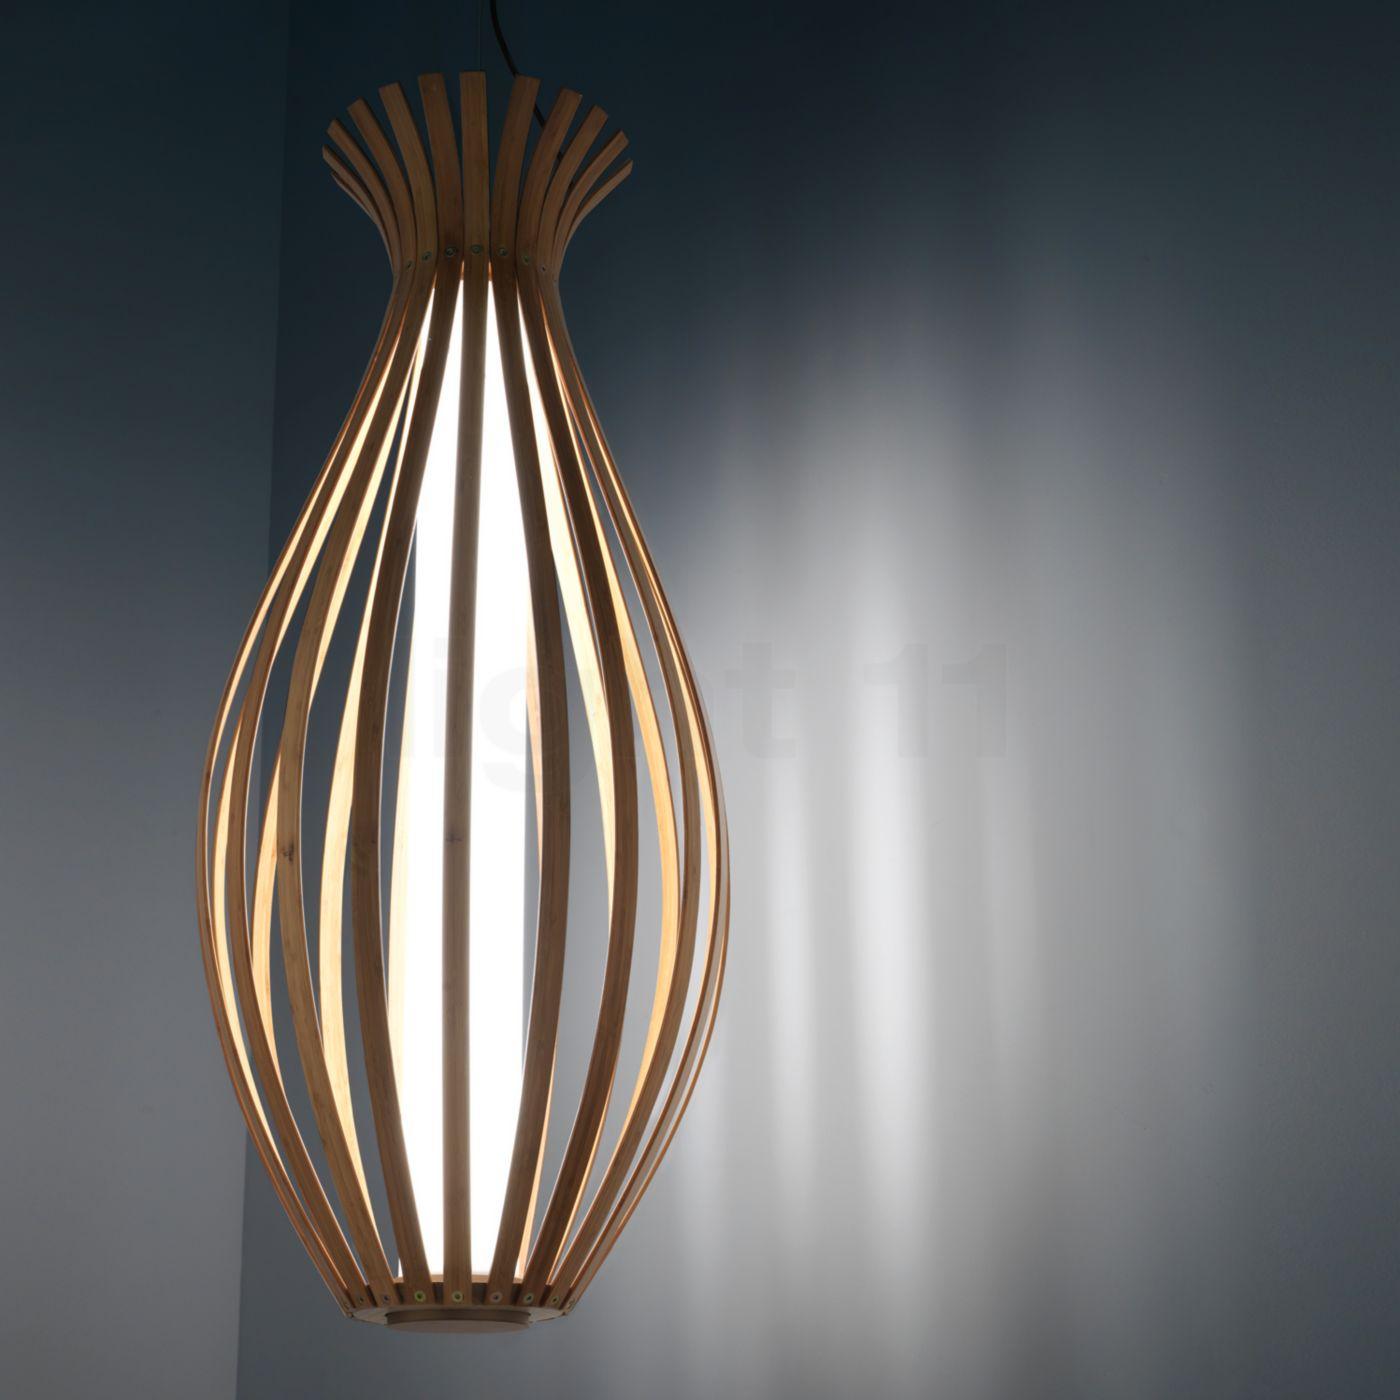 Buy leds c4 bamboo pendant light led at light11 aloadofball Images